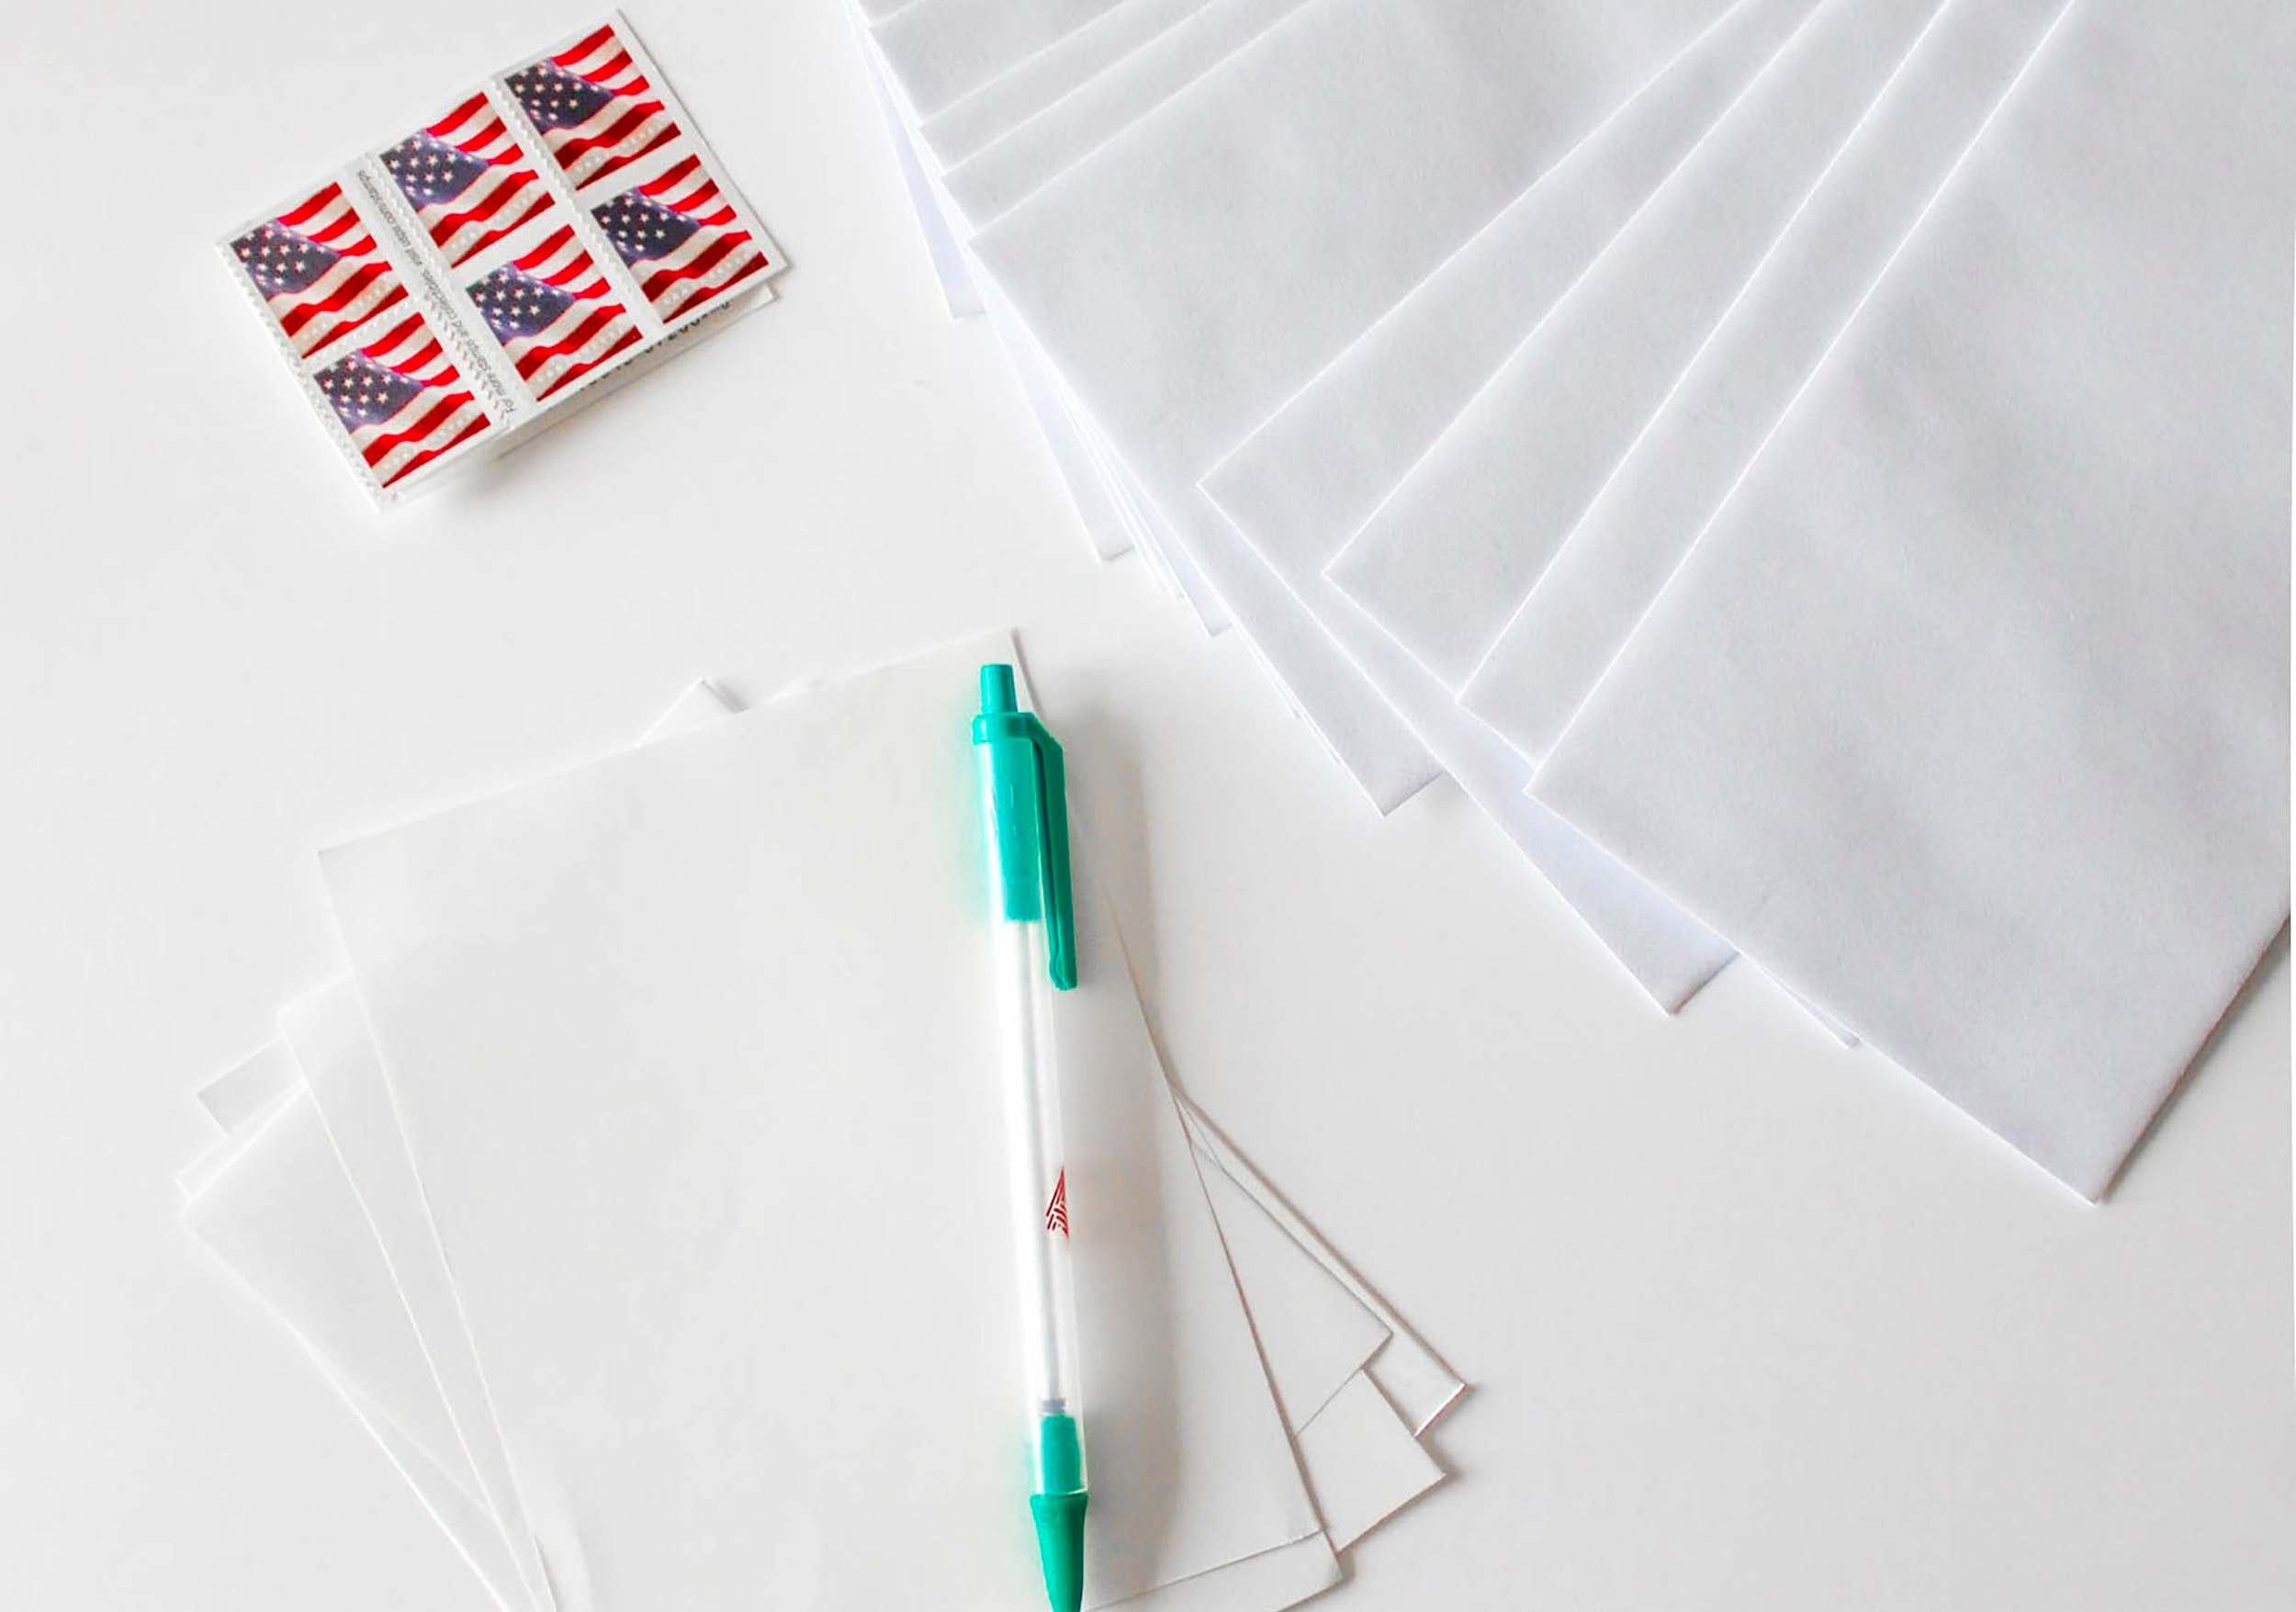 america-american-flag-blank-1550341.jpg